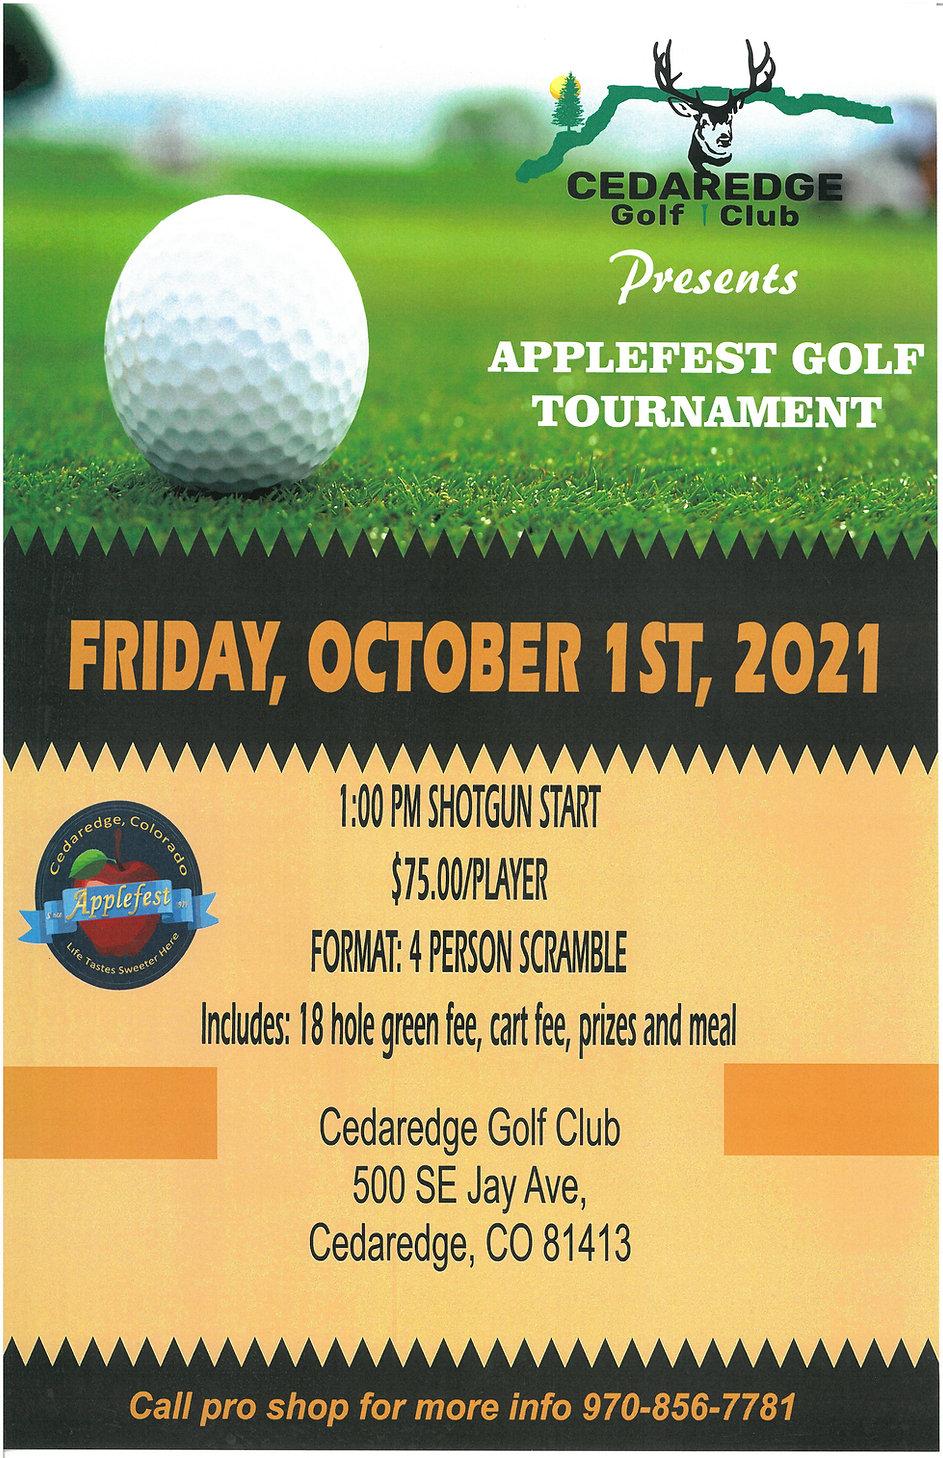 Applefest Golf Tourney.jpg